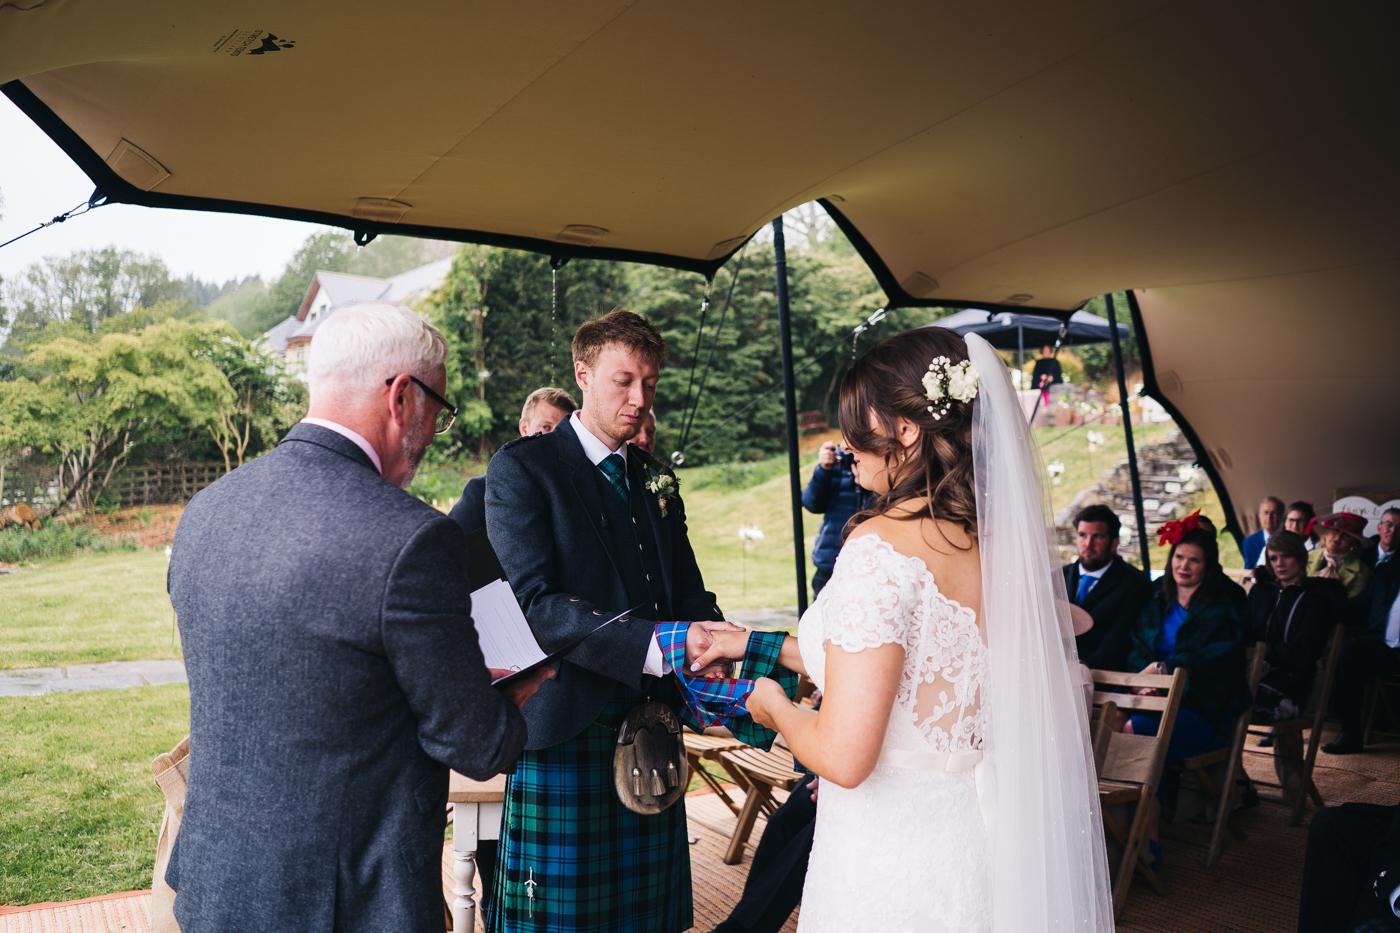 scottish-wedding-trossachs-loch-tay-highlannds-relaxed-photography-photographer-0022.jpg